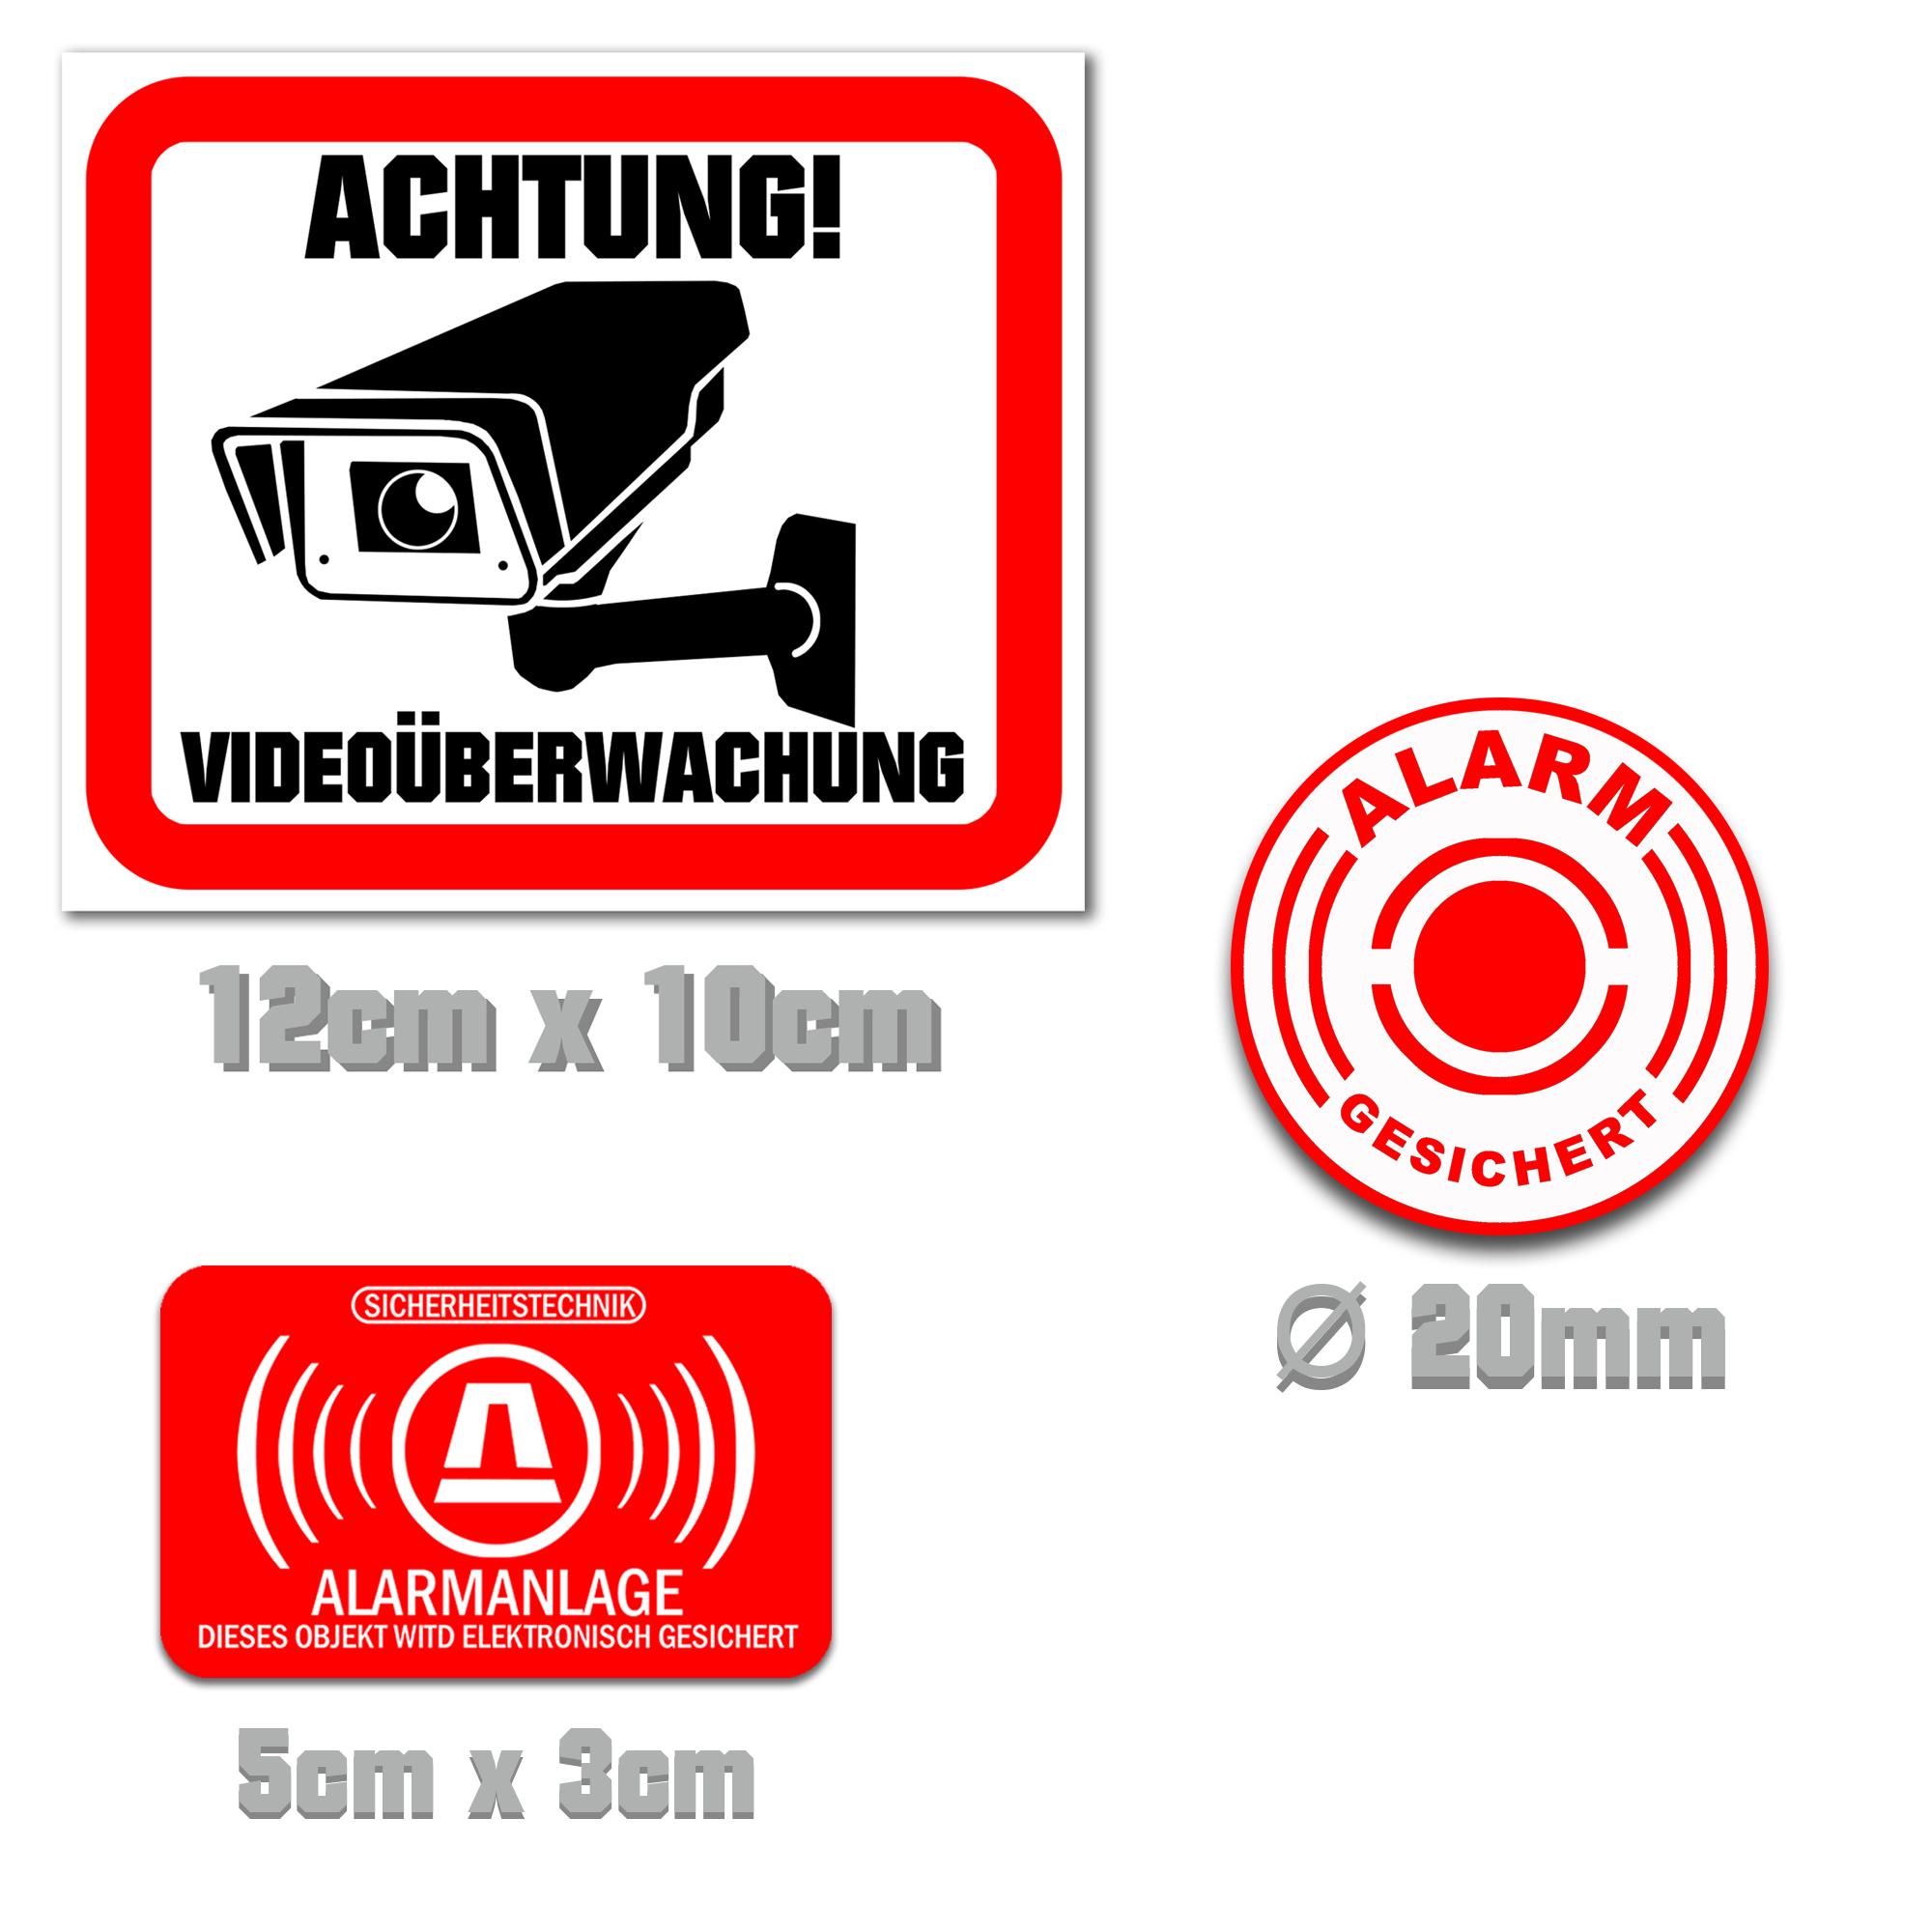 1 50 Stk Aufkleber Videouberwachung Alarm Alarmgesichert